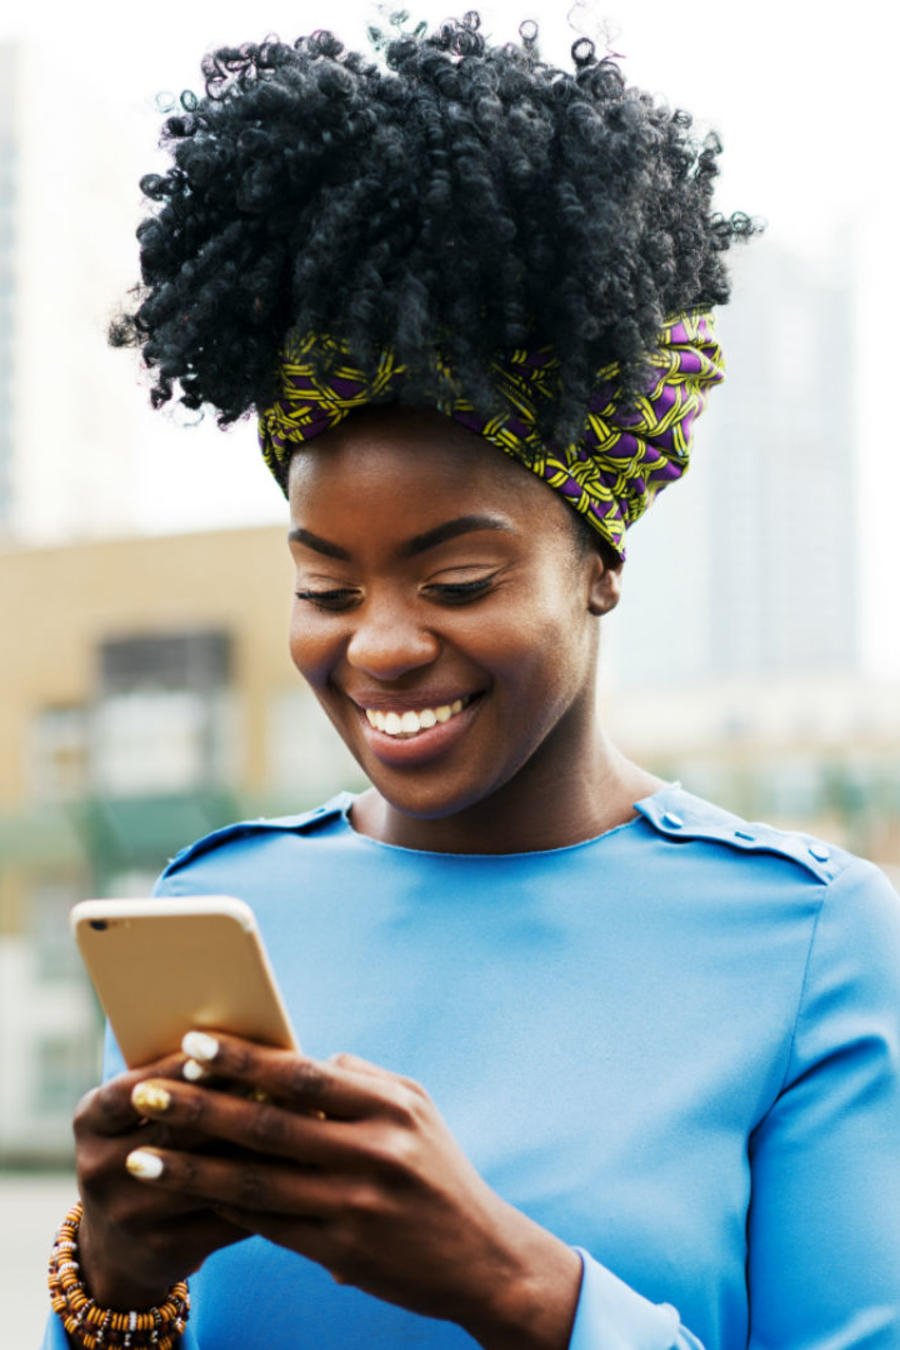 Mujer revisando app móvil